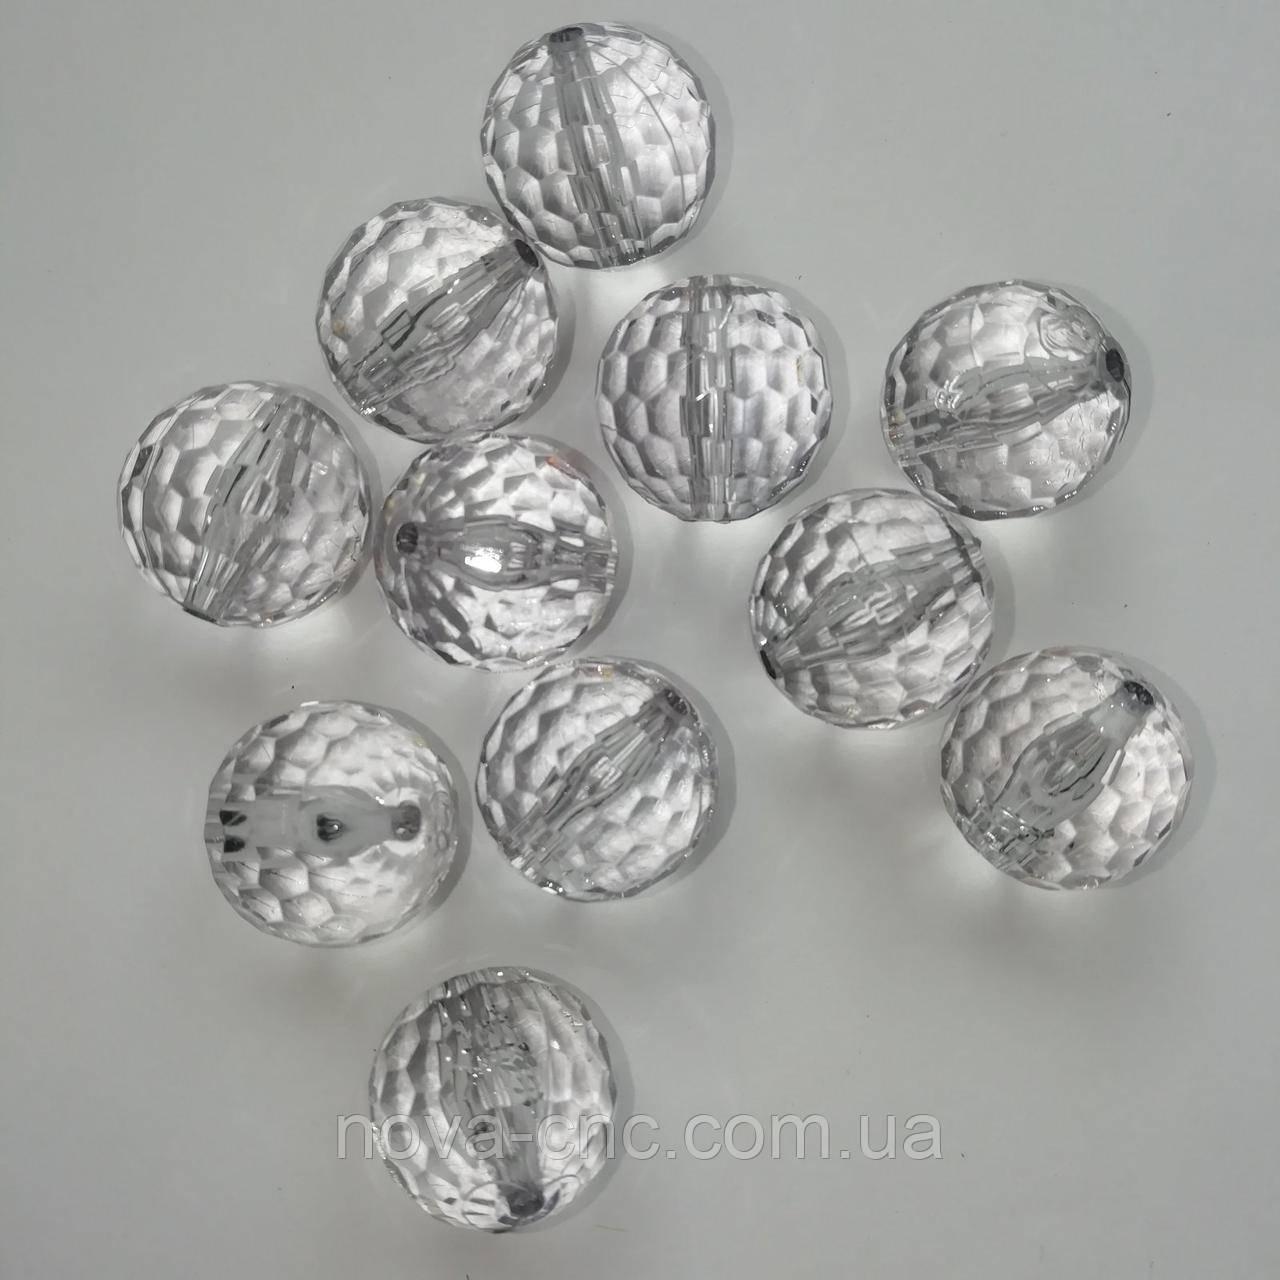 "Бусины "" Шар Гранатик"" акрил светло-серый 18 мм 500 грамм"